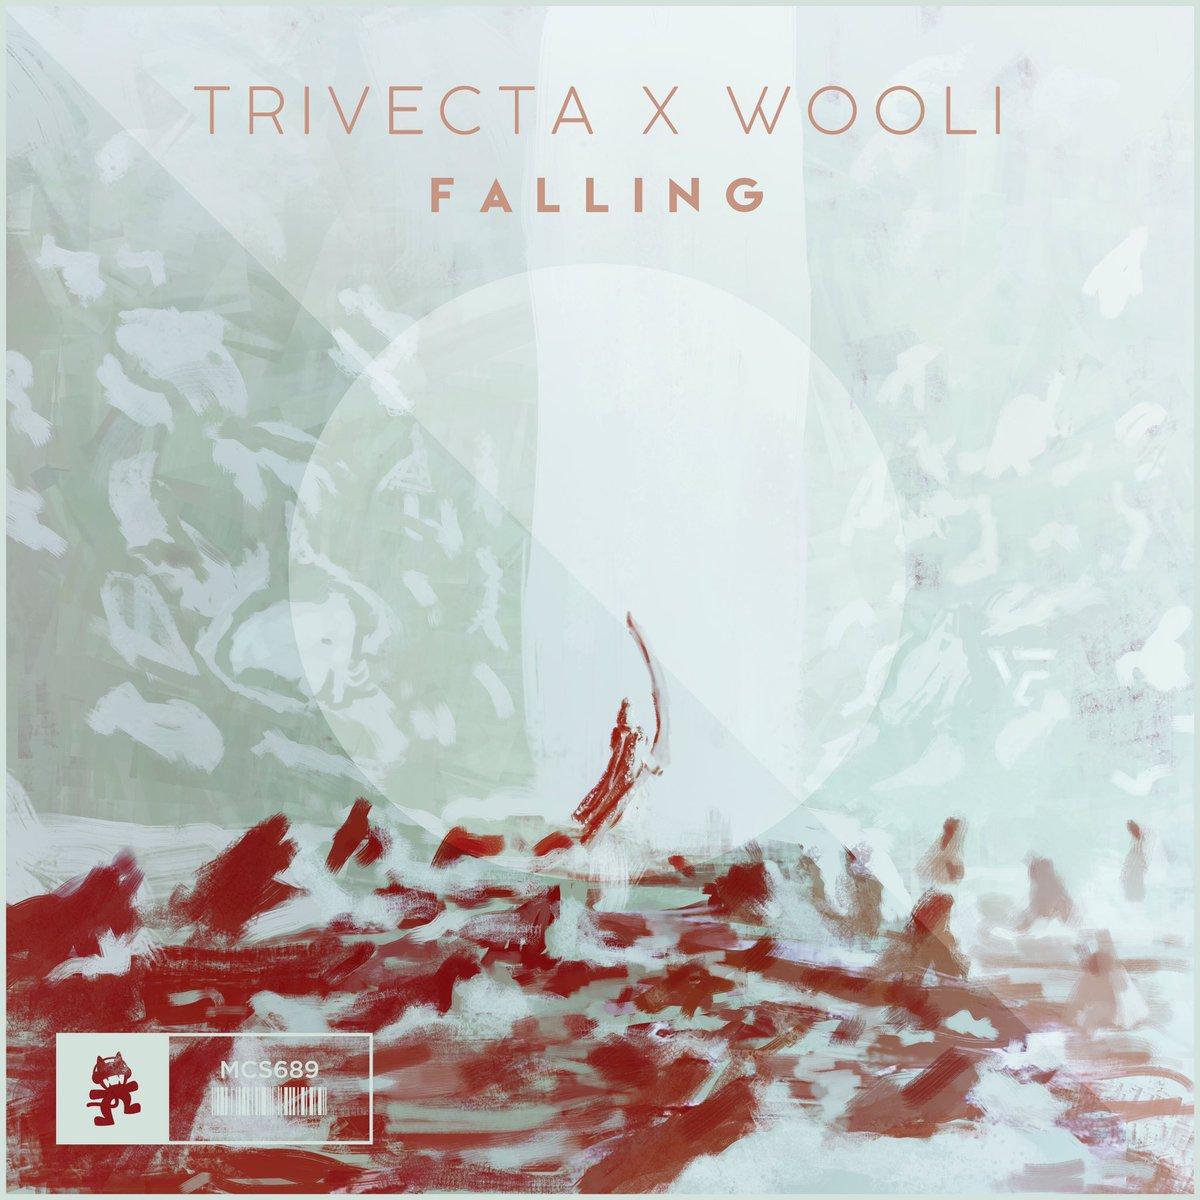 Falling (Trivecta & Wooli)